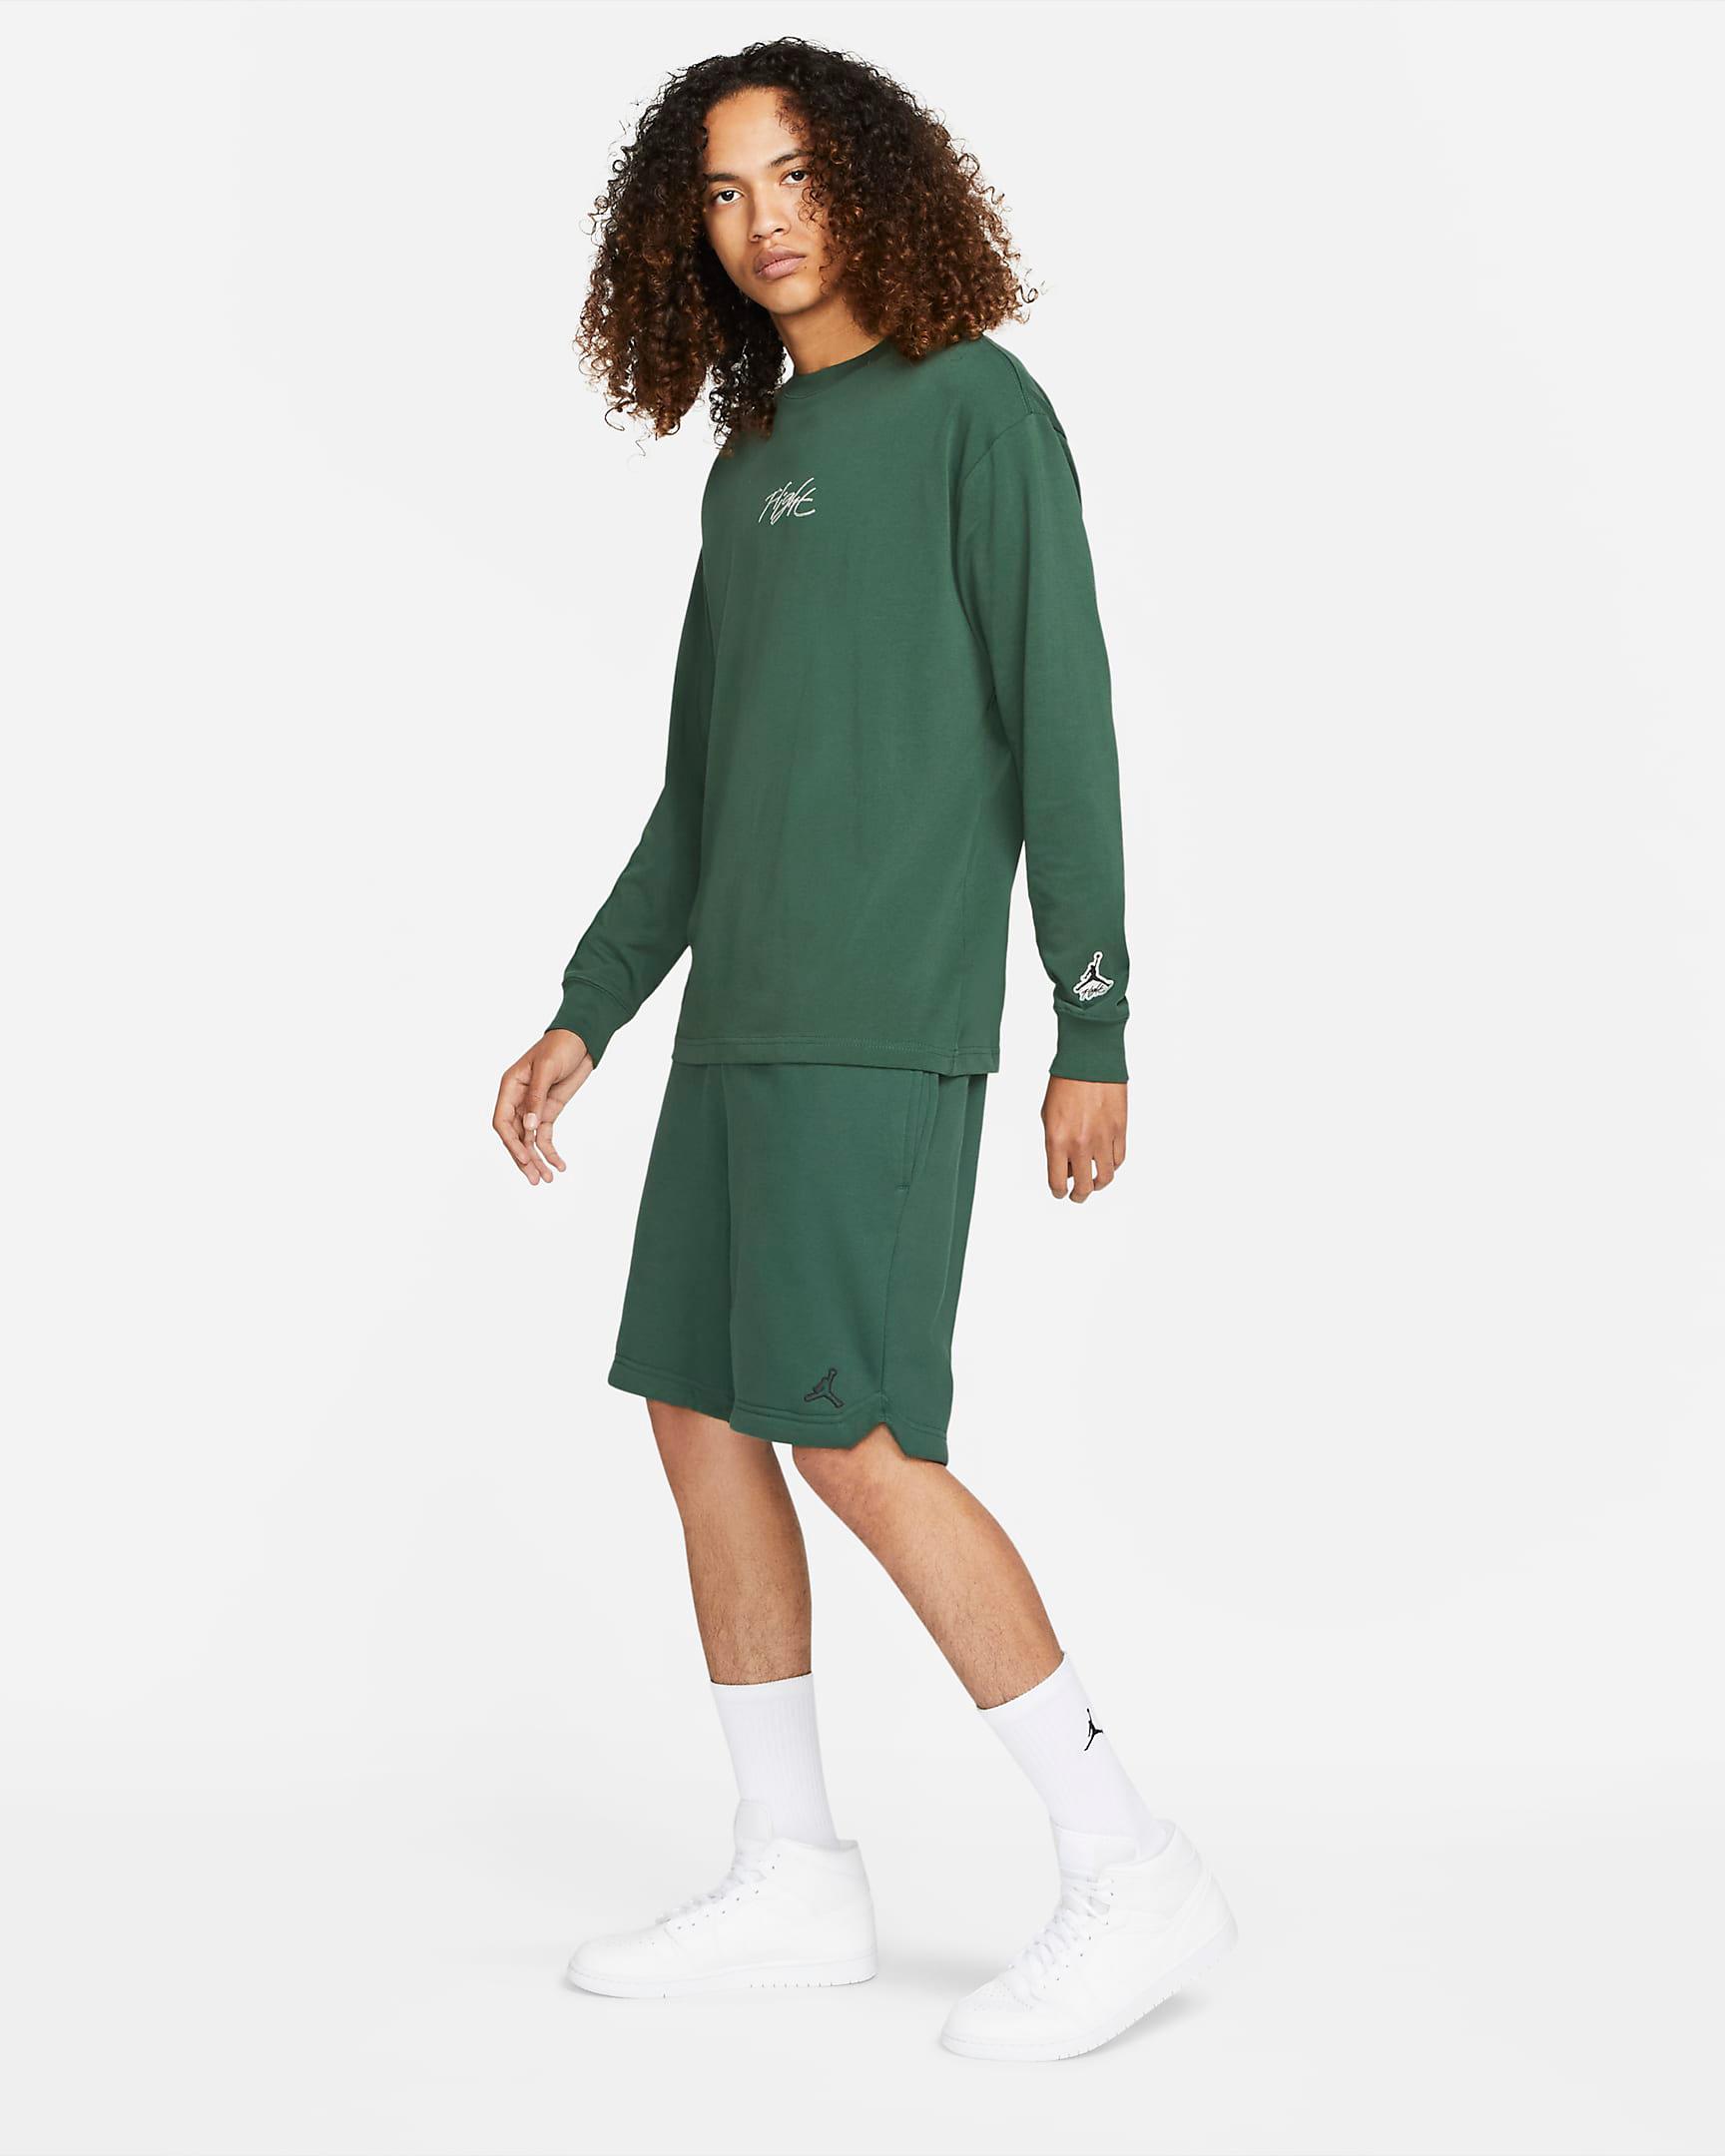 jordan-noble-green-flight-essentials-long-sleeve-shirt-shorts-outfit